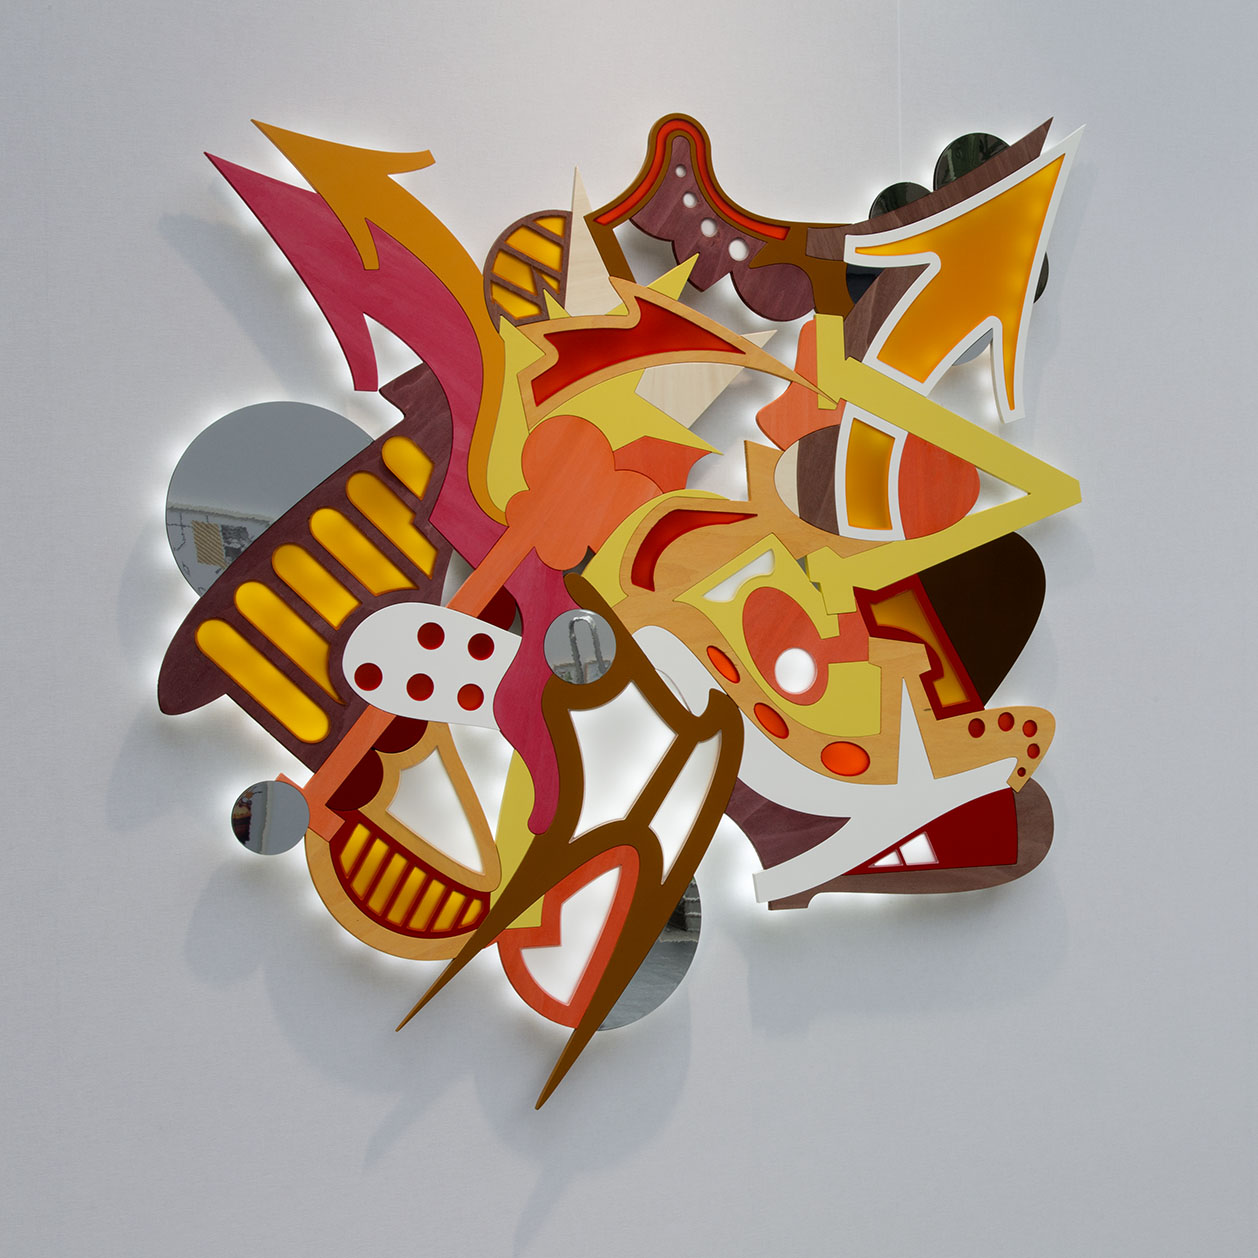 JonOne,  Untitled , 2014, Wood, Plexiglas, LED lights - 160 x 160 cm - Courtesy the artist and Rabouan Moussion Gallery Paris